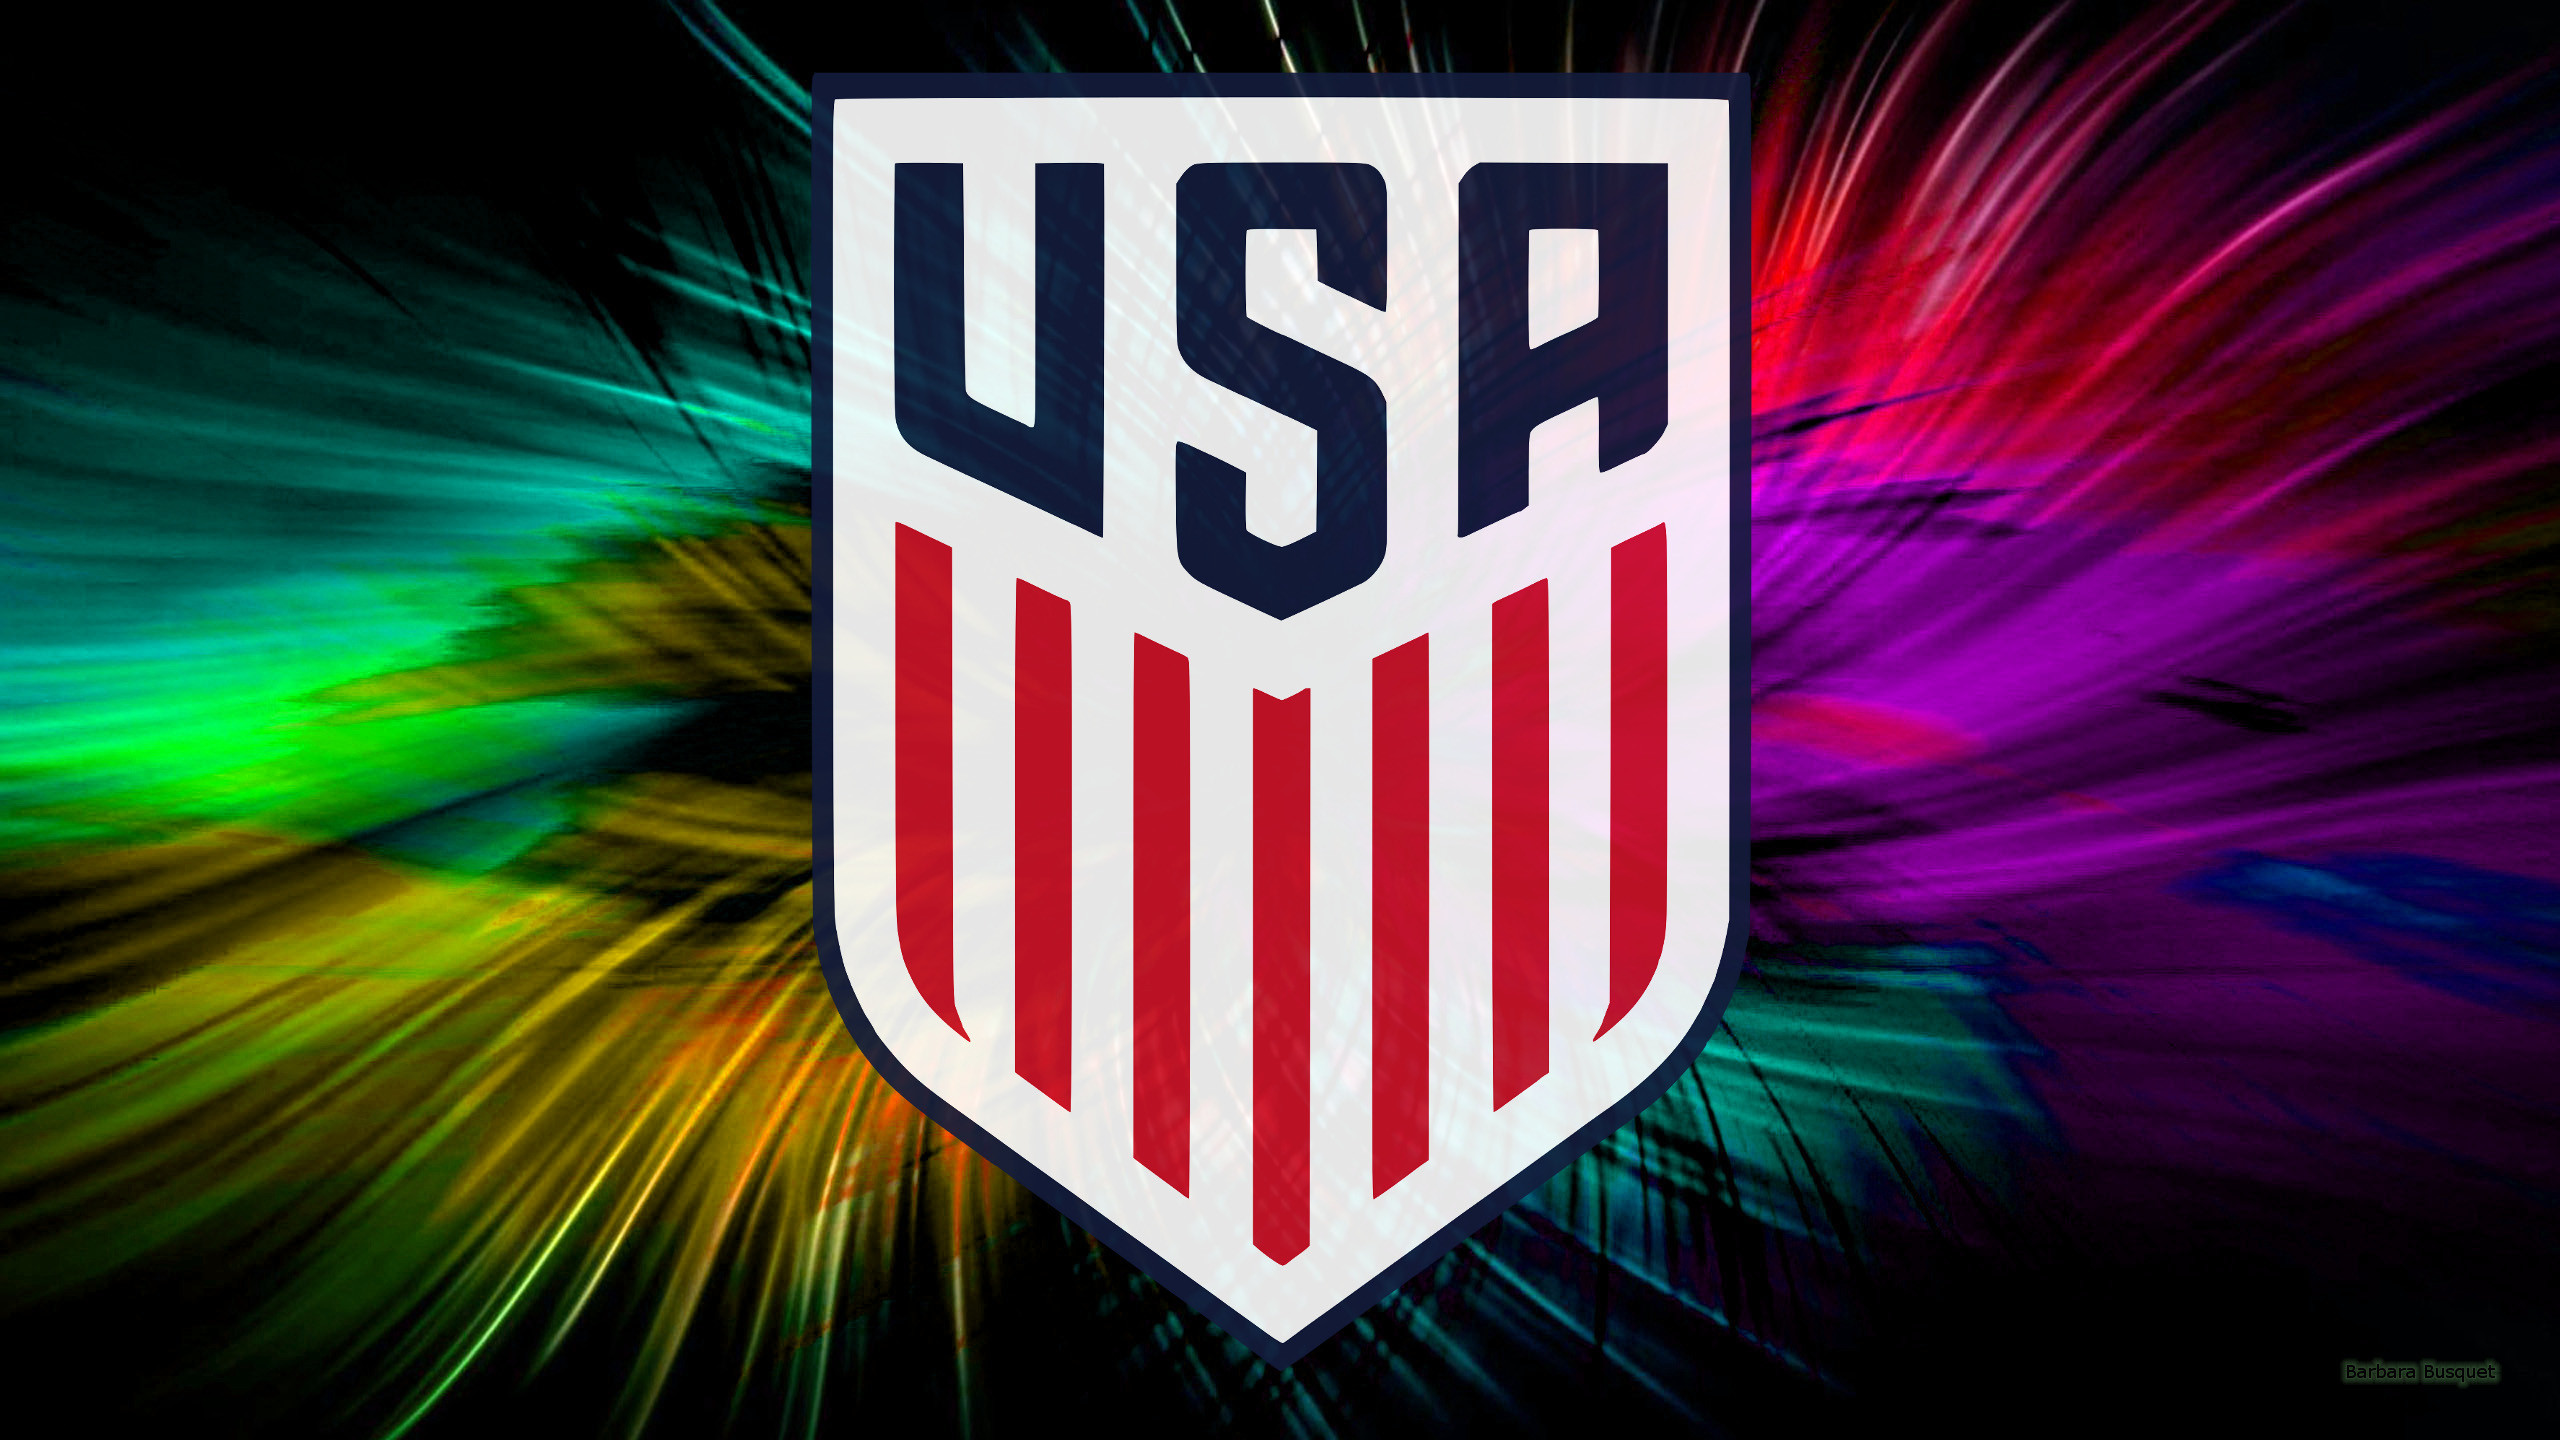 2560x1440px Us Soccer Wallpaper - WallpaperSafari  2560x1440px Us ...